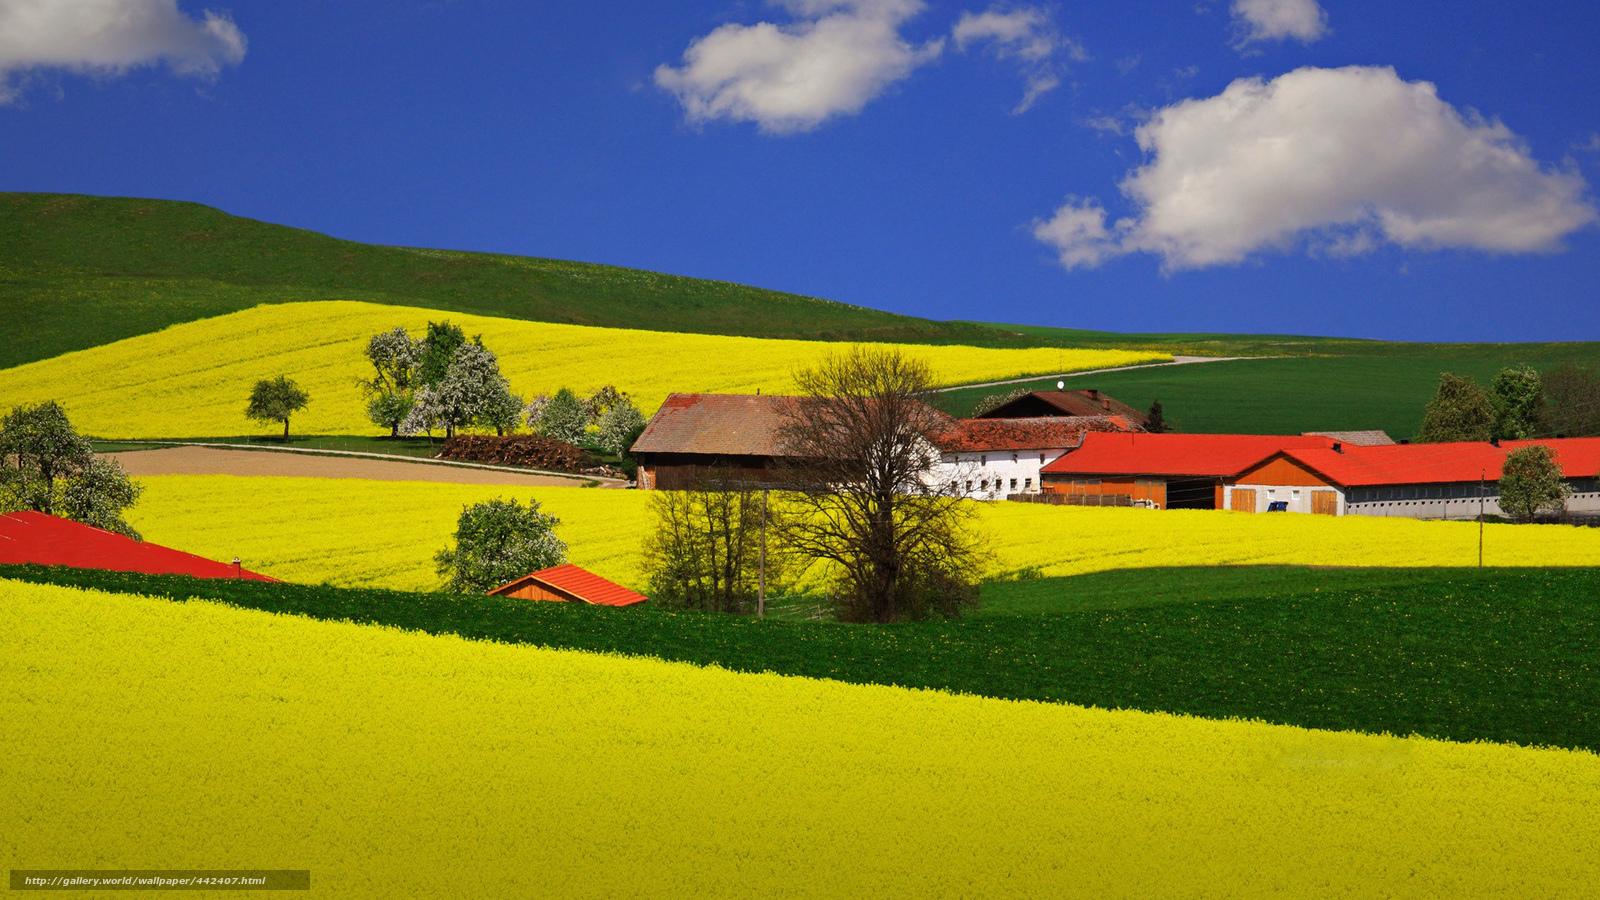 Download wallpaper field houses summer farm free desktop wallpaper